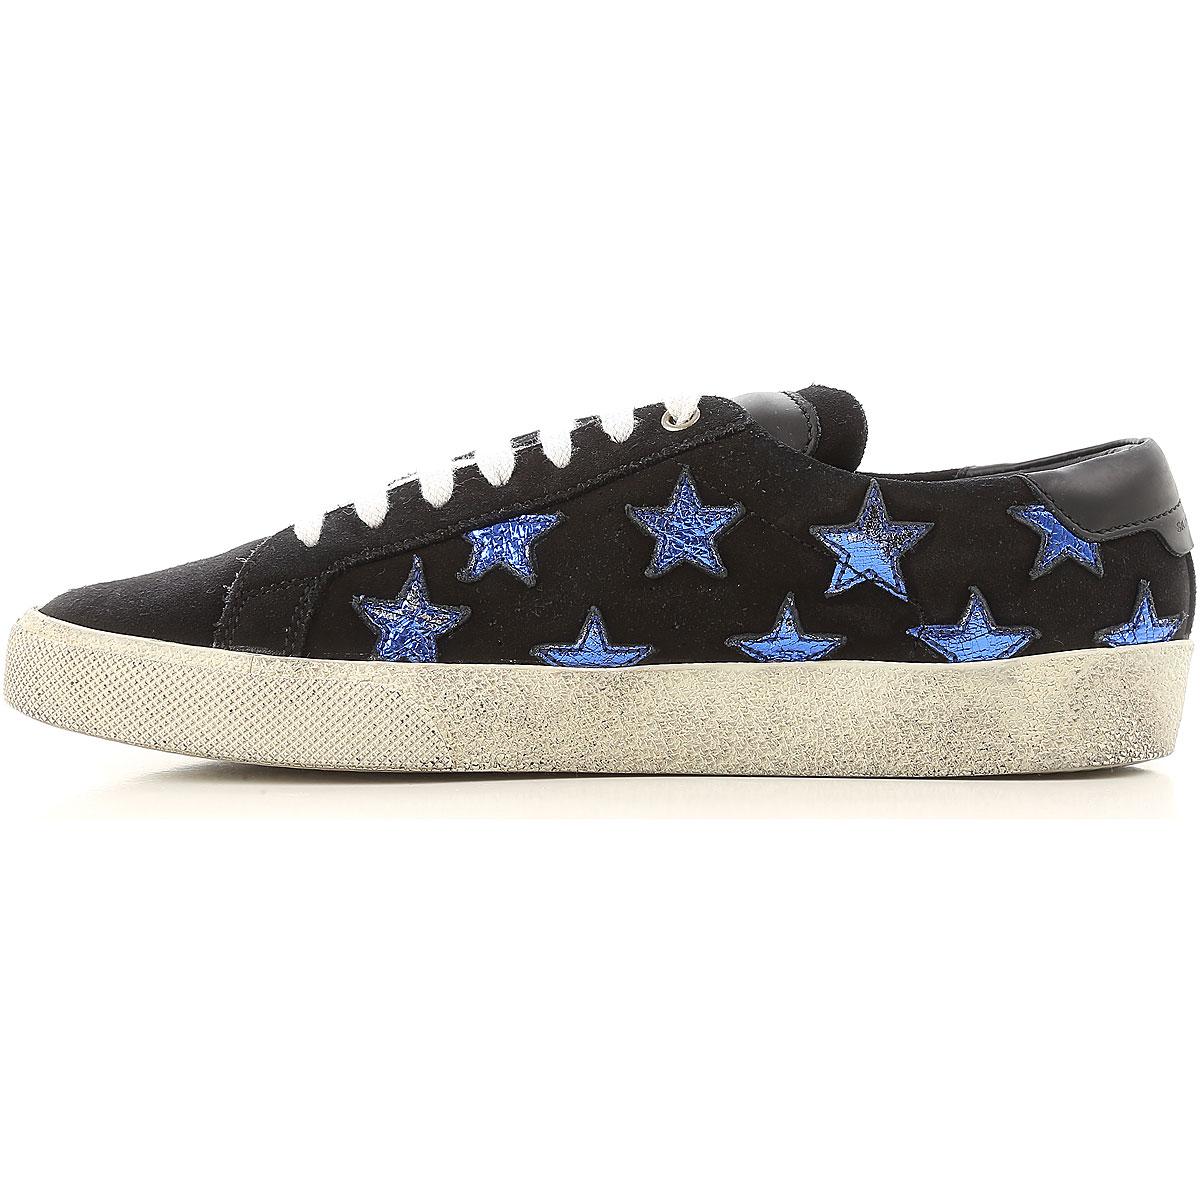 Scarpe Donna Sneakers Yves Saint Laurent Offerte Limitate